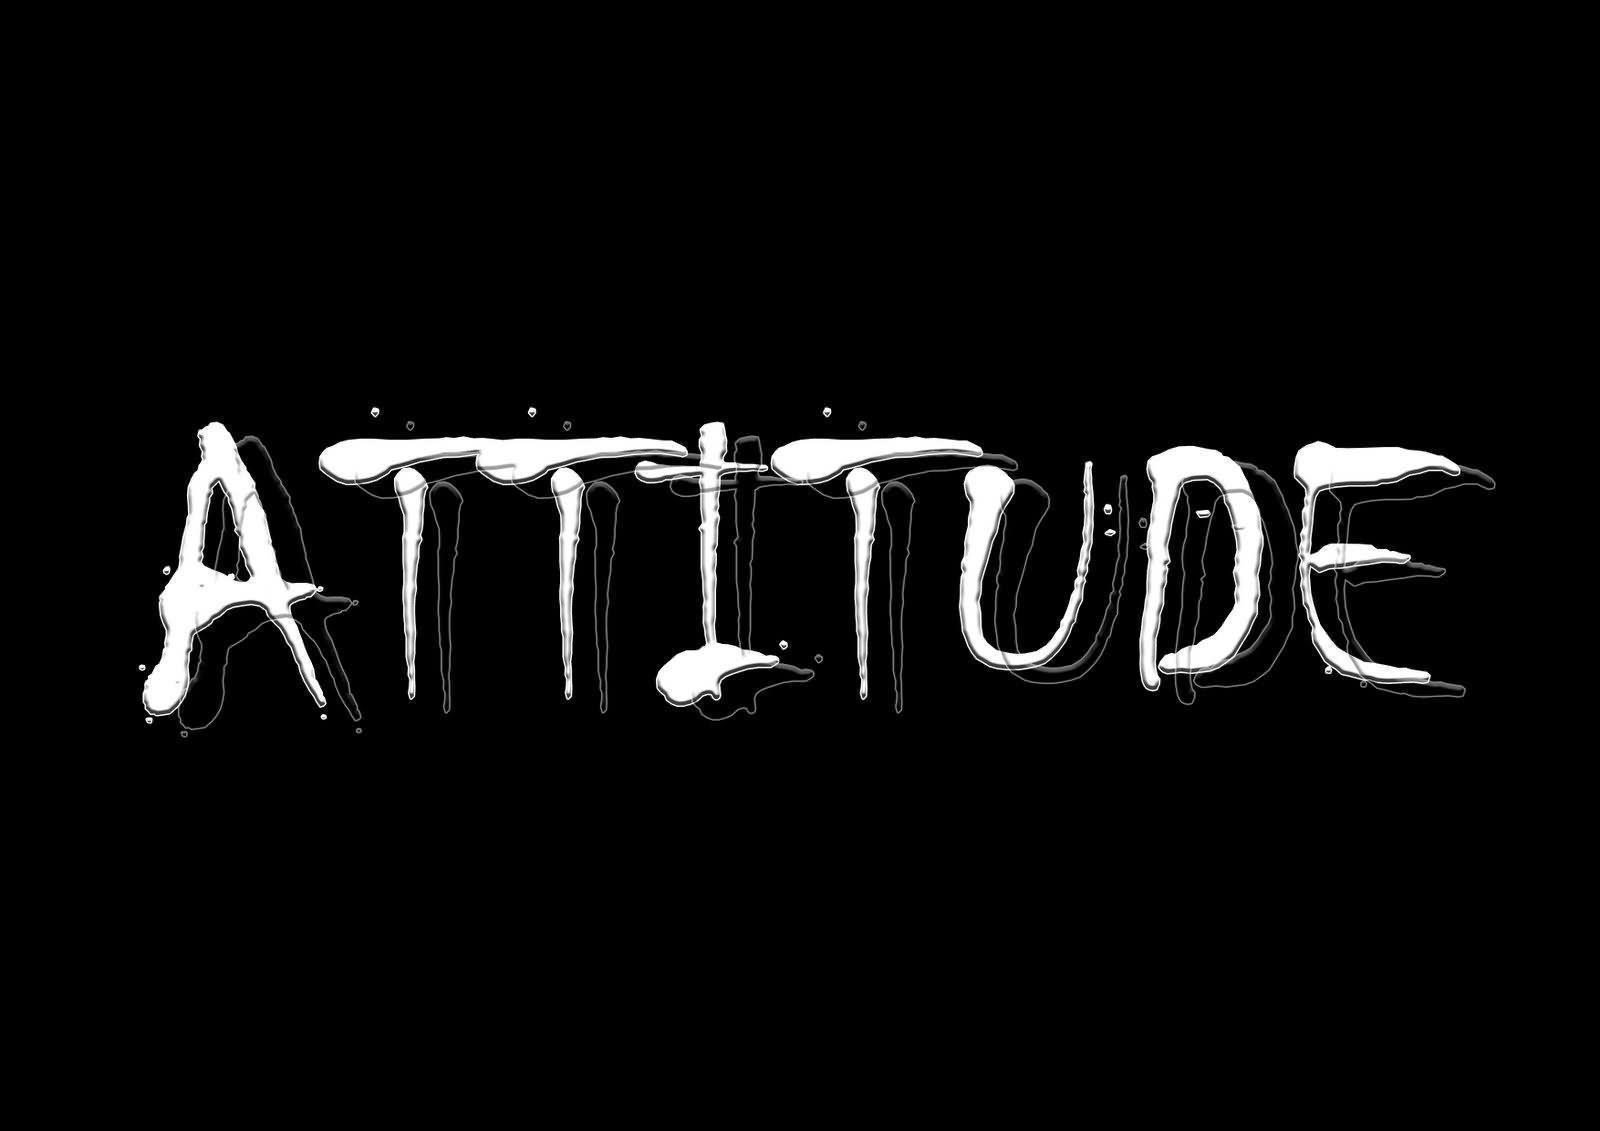 wallpaper quotes on attitude - photo #21